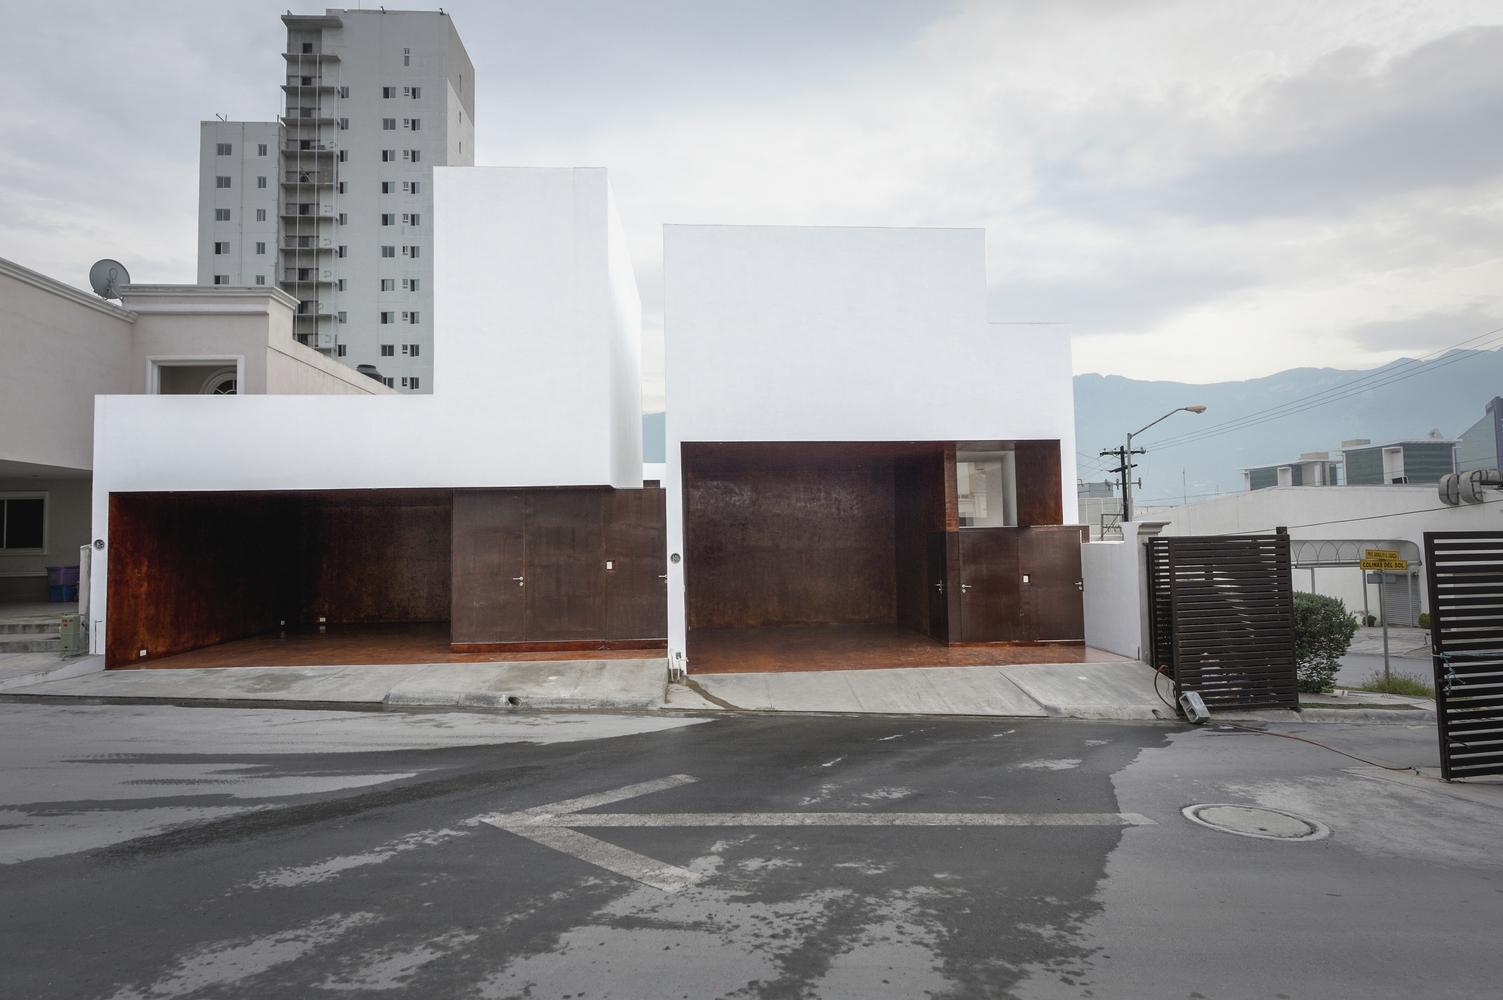 Arquitectura mexicana que rompe moldes despiertaymira for Arquitectura mexicana